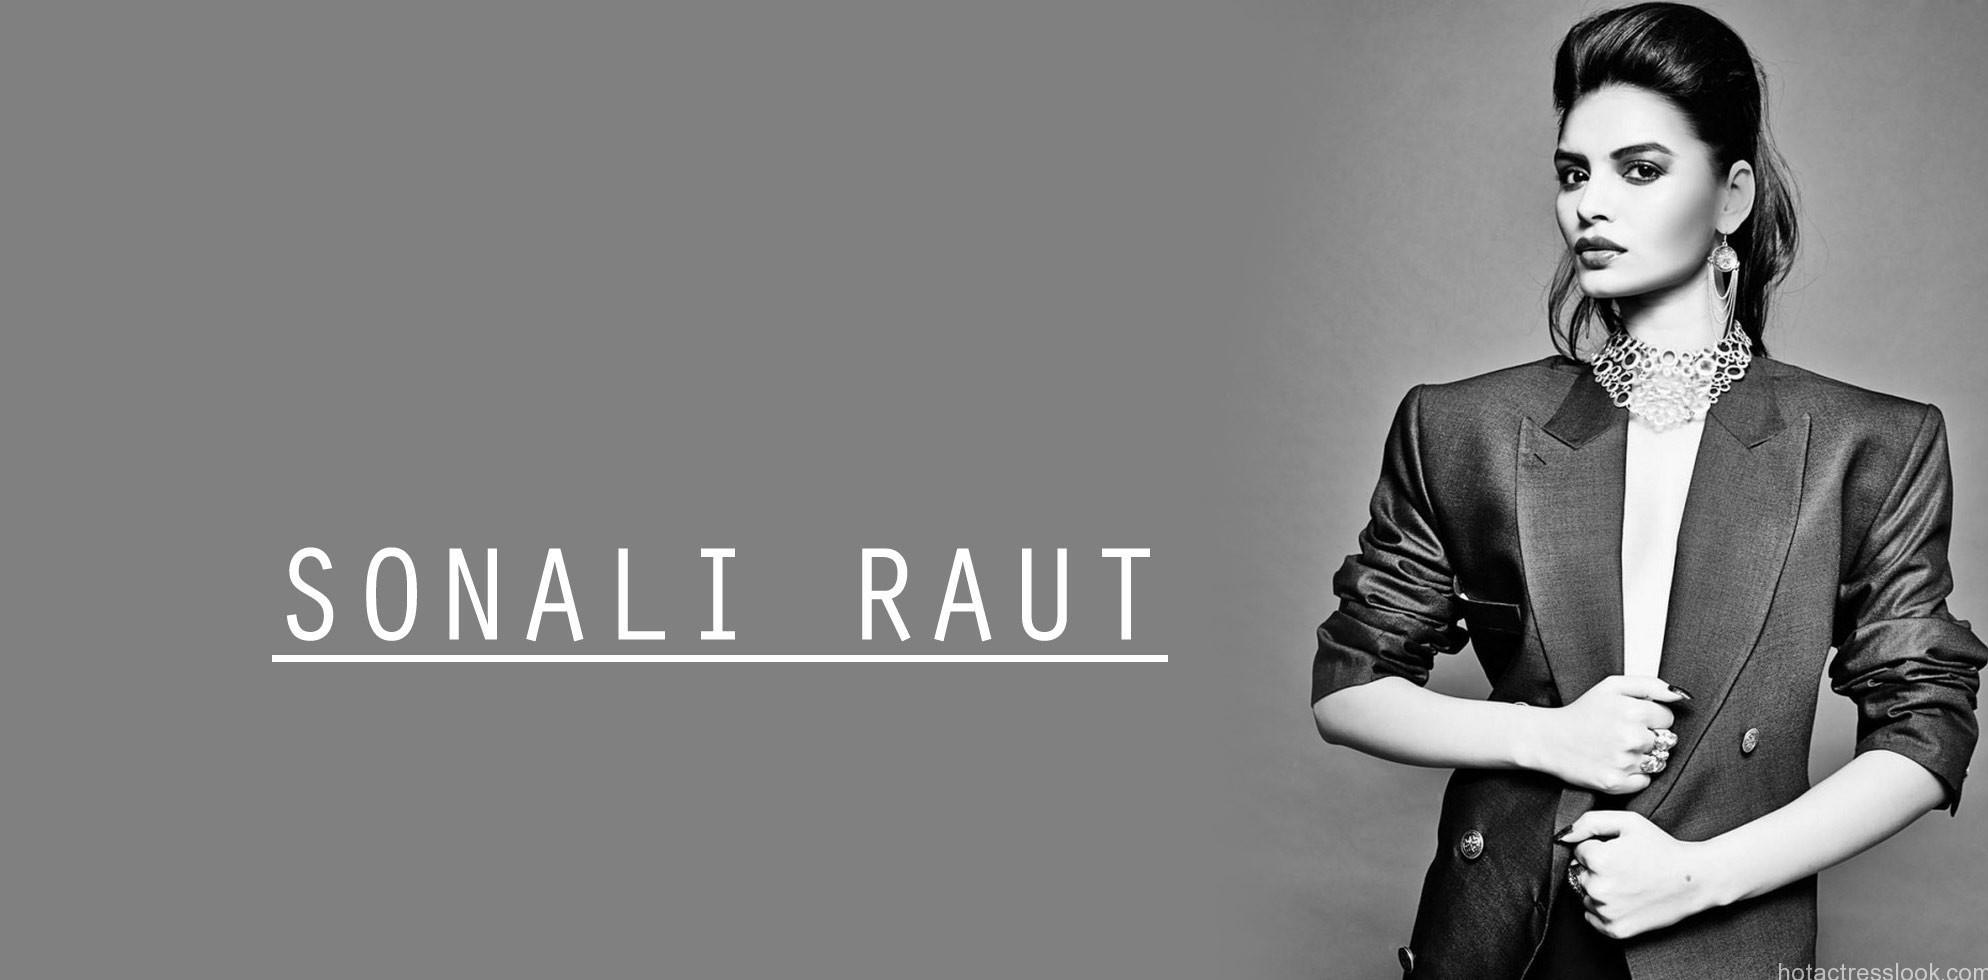 Sonali Raut The Kingfisher Calendar Model Actress